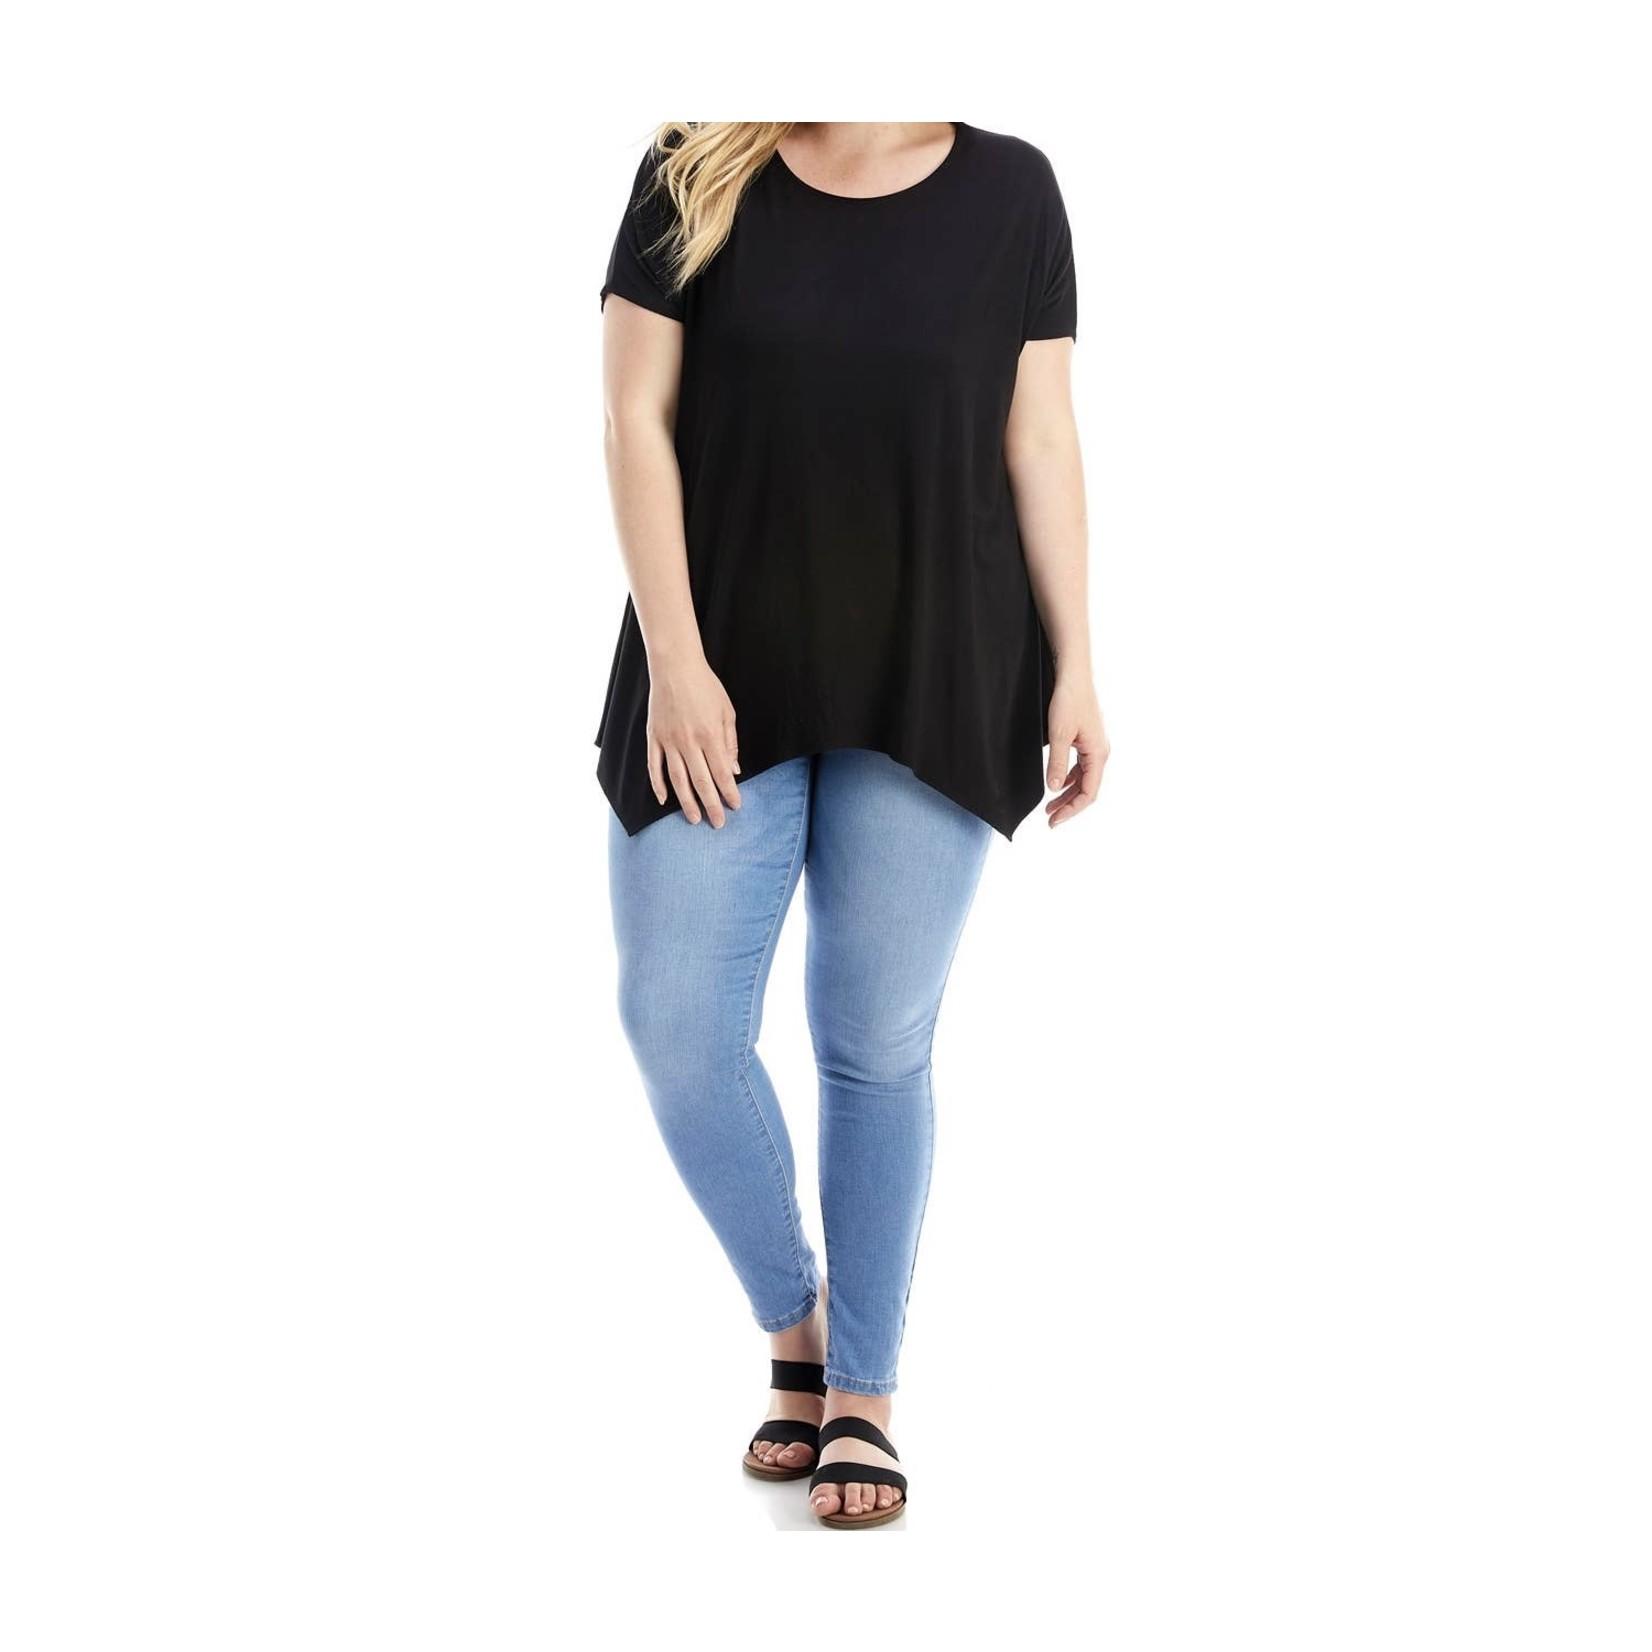 Azules PS: Asymmetric Short Sleeve Tunic